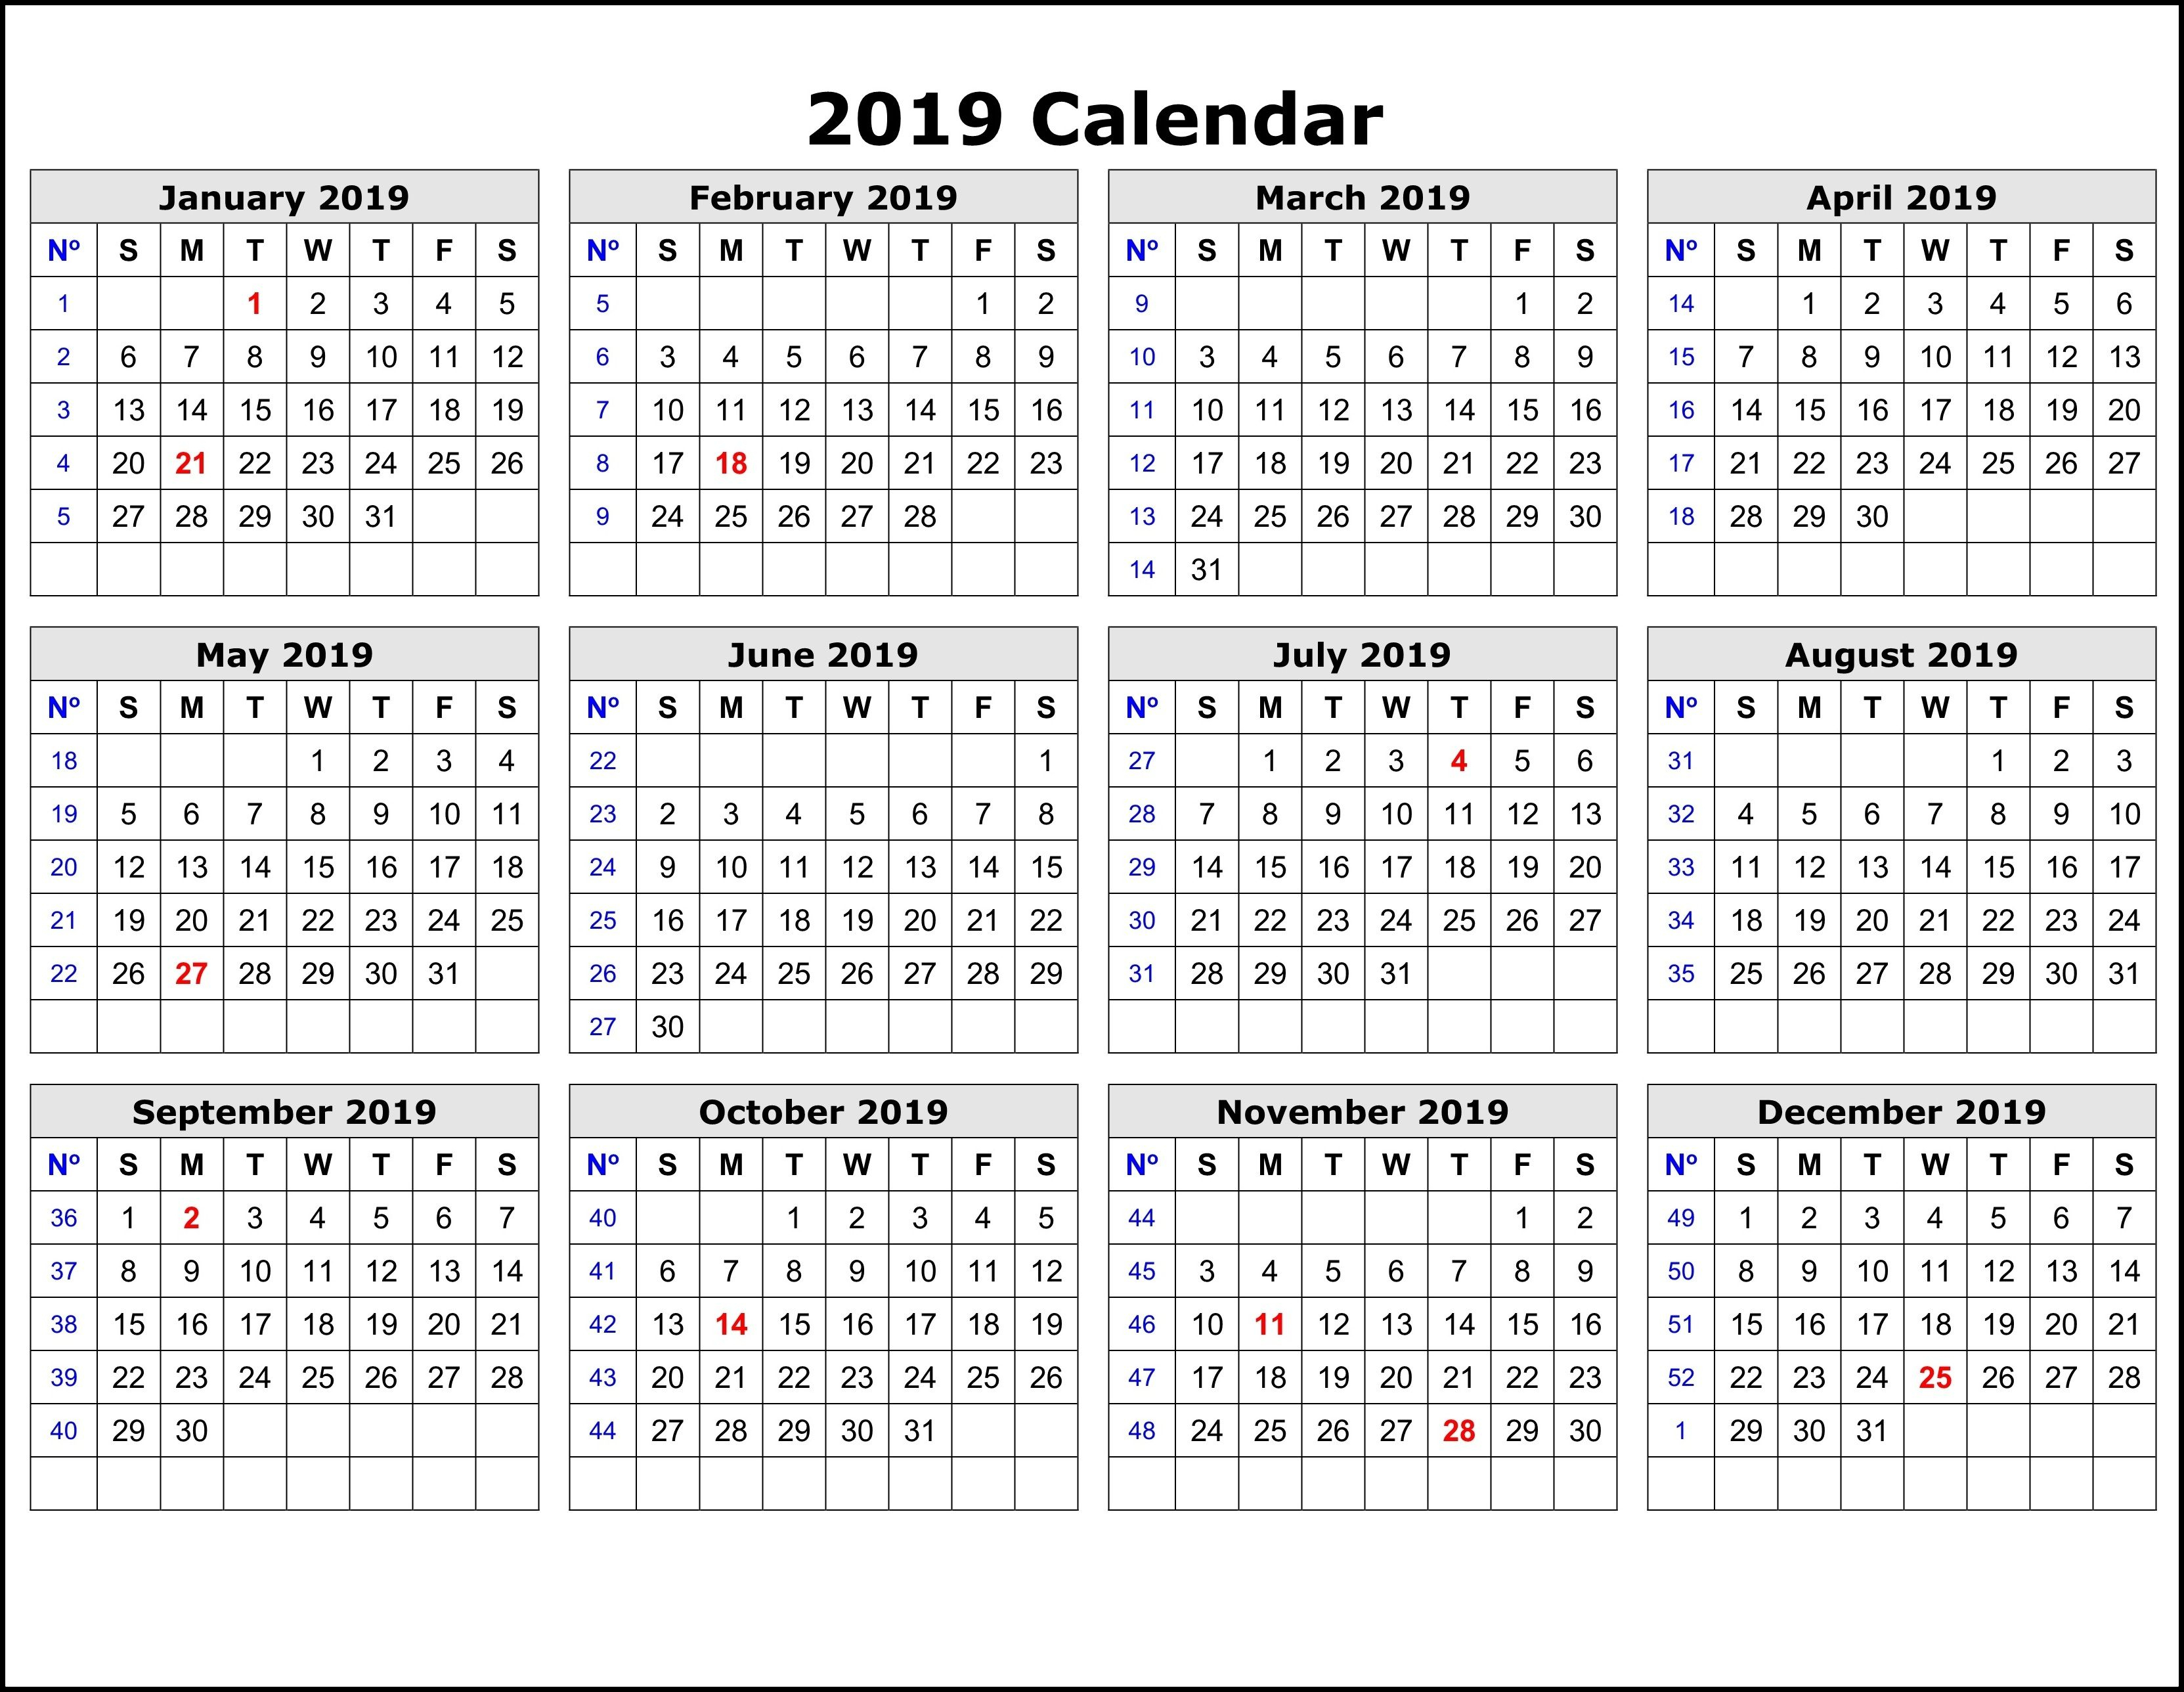 2019 Calendar Templateweek   2019 Calendar Template In